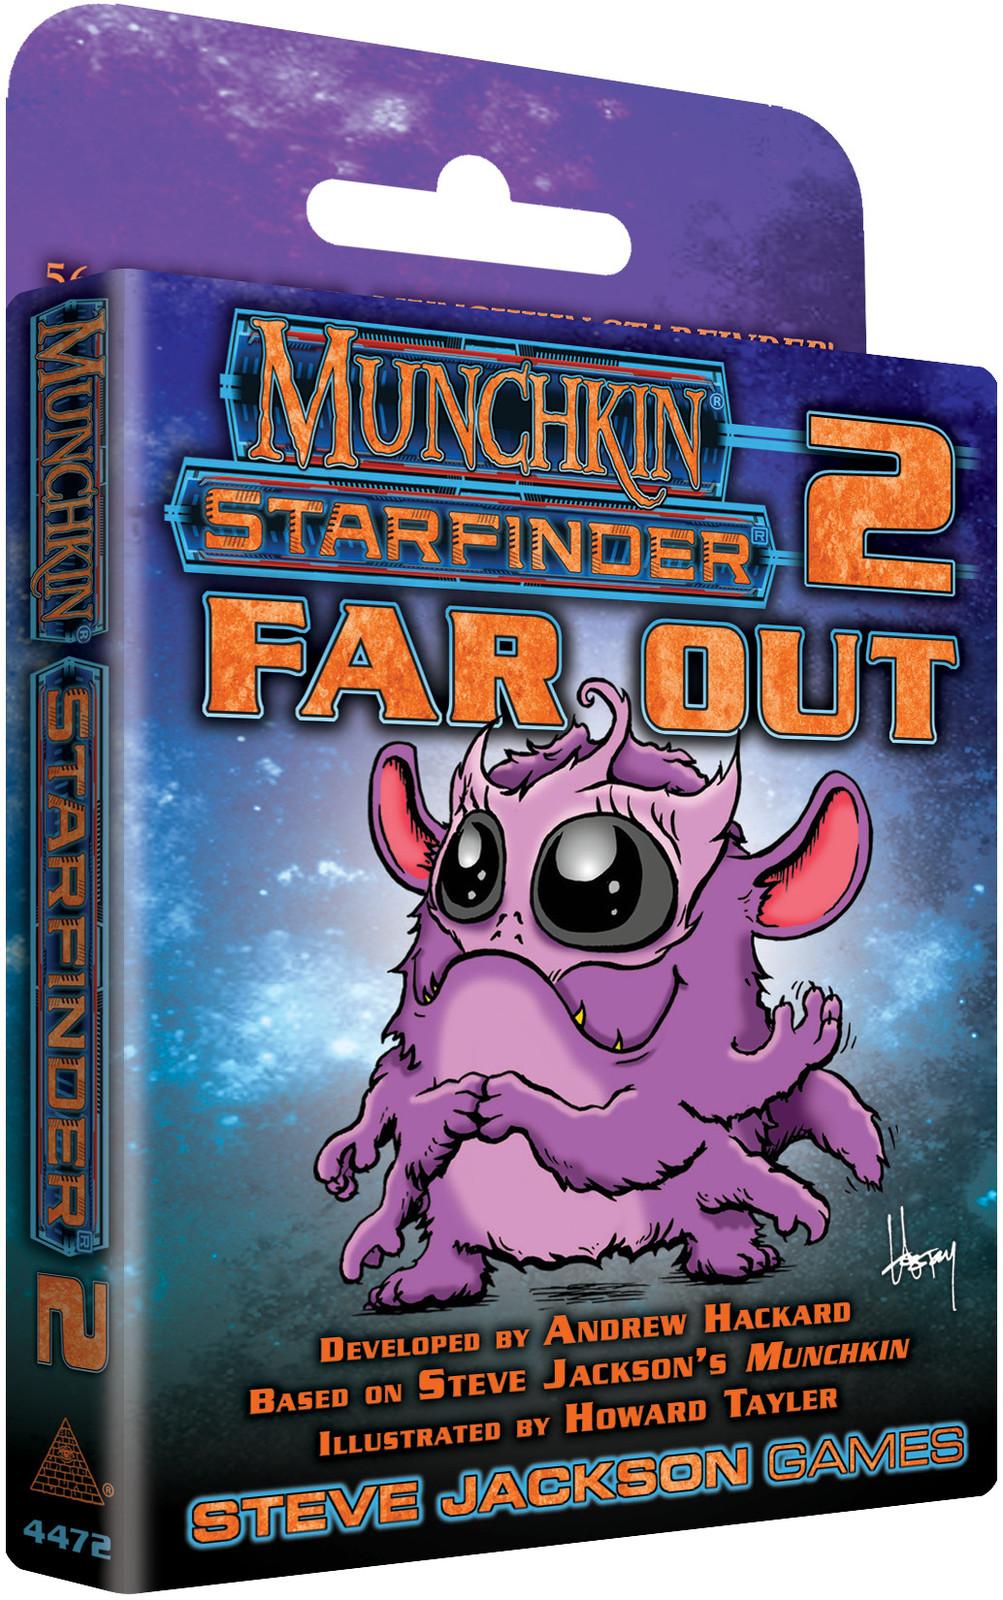 Munchkin: Starfinder #2 - Far Out image